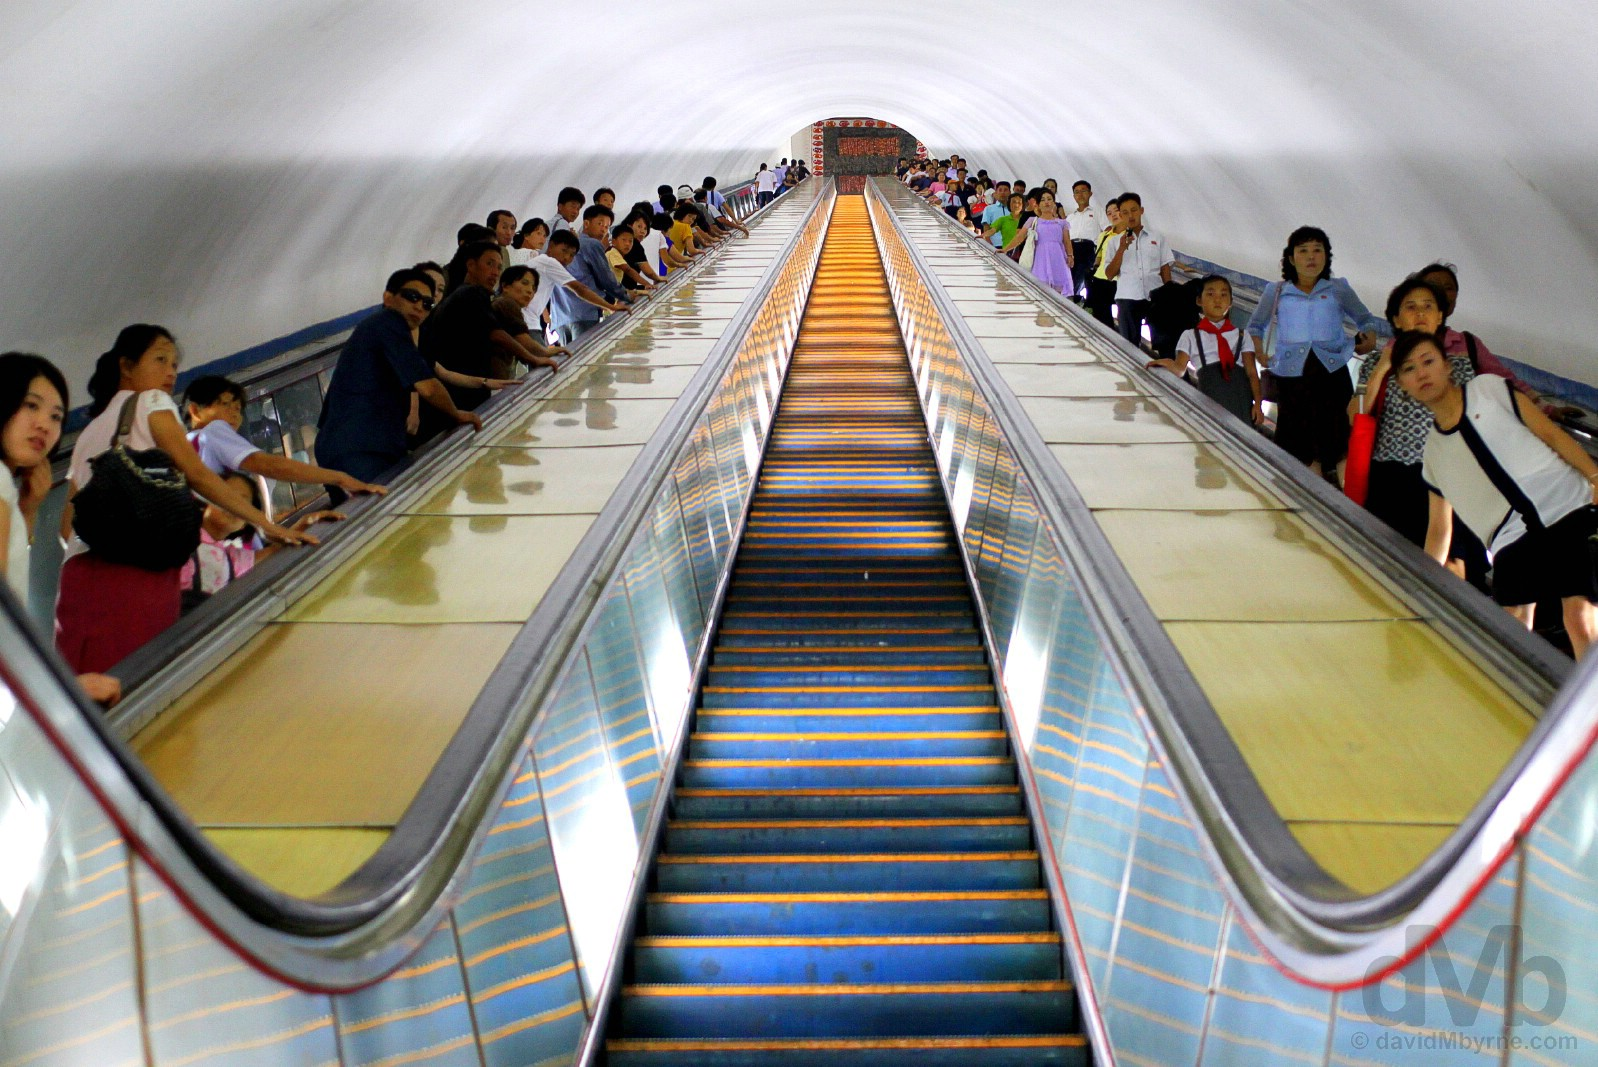 Entering the Pyongyang Metro, the world's deepest. Pyongyang, North Korea. August 15, 2017.